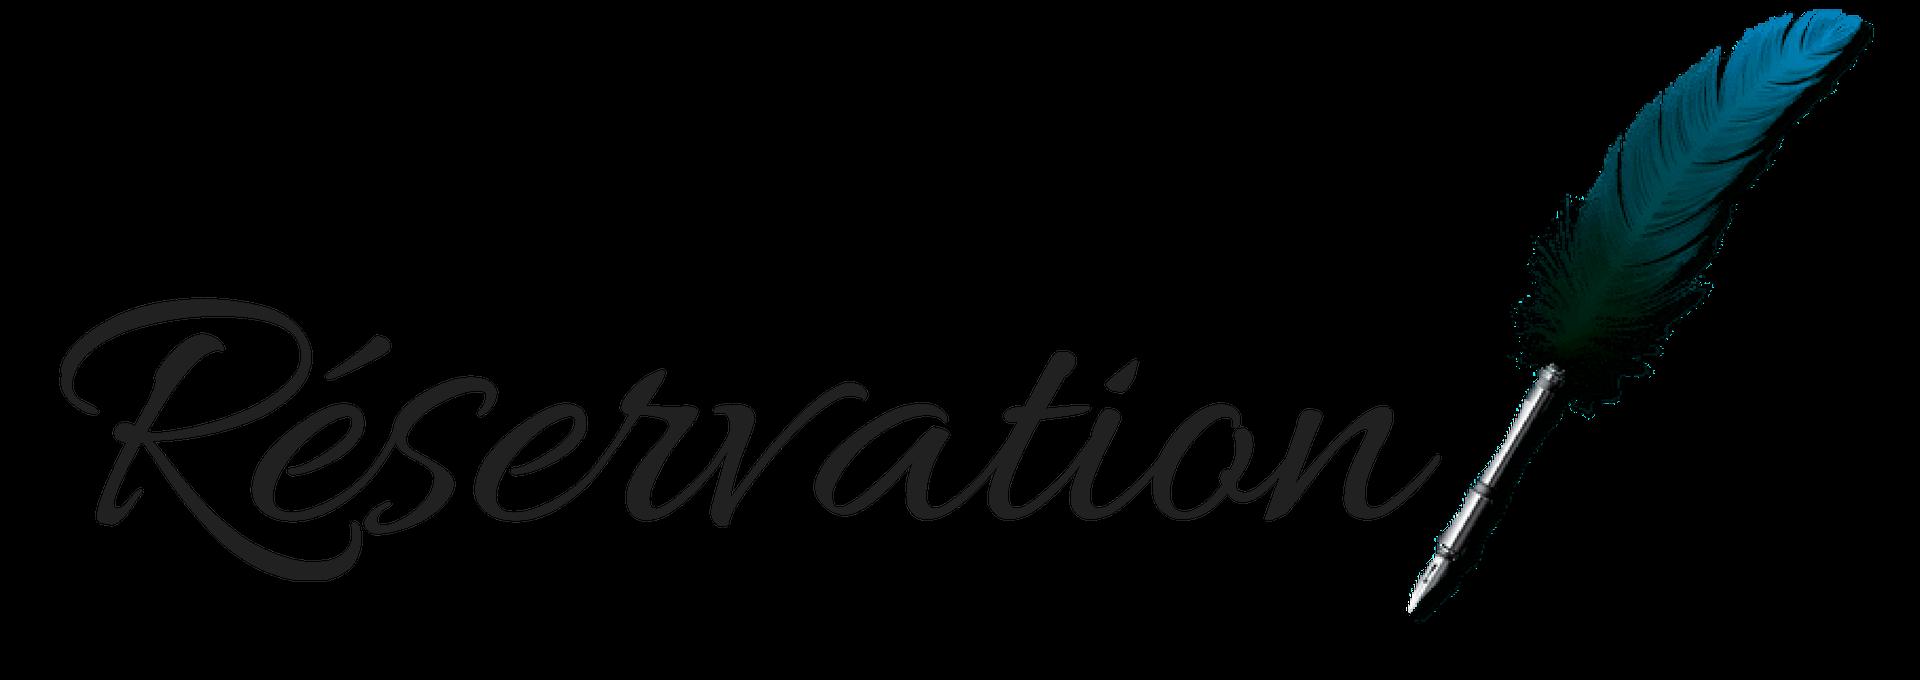 Reservation (3).png